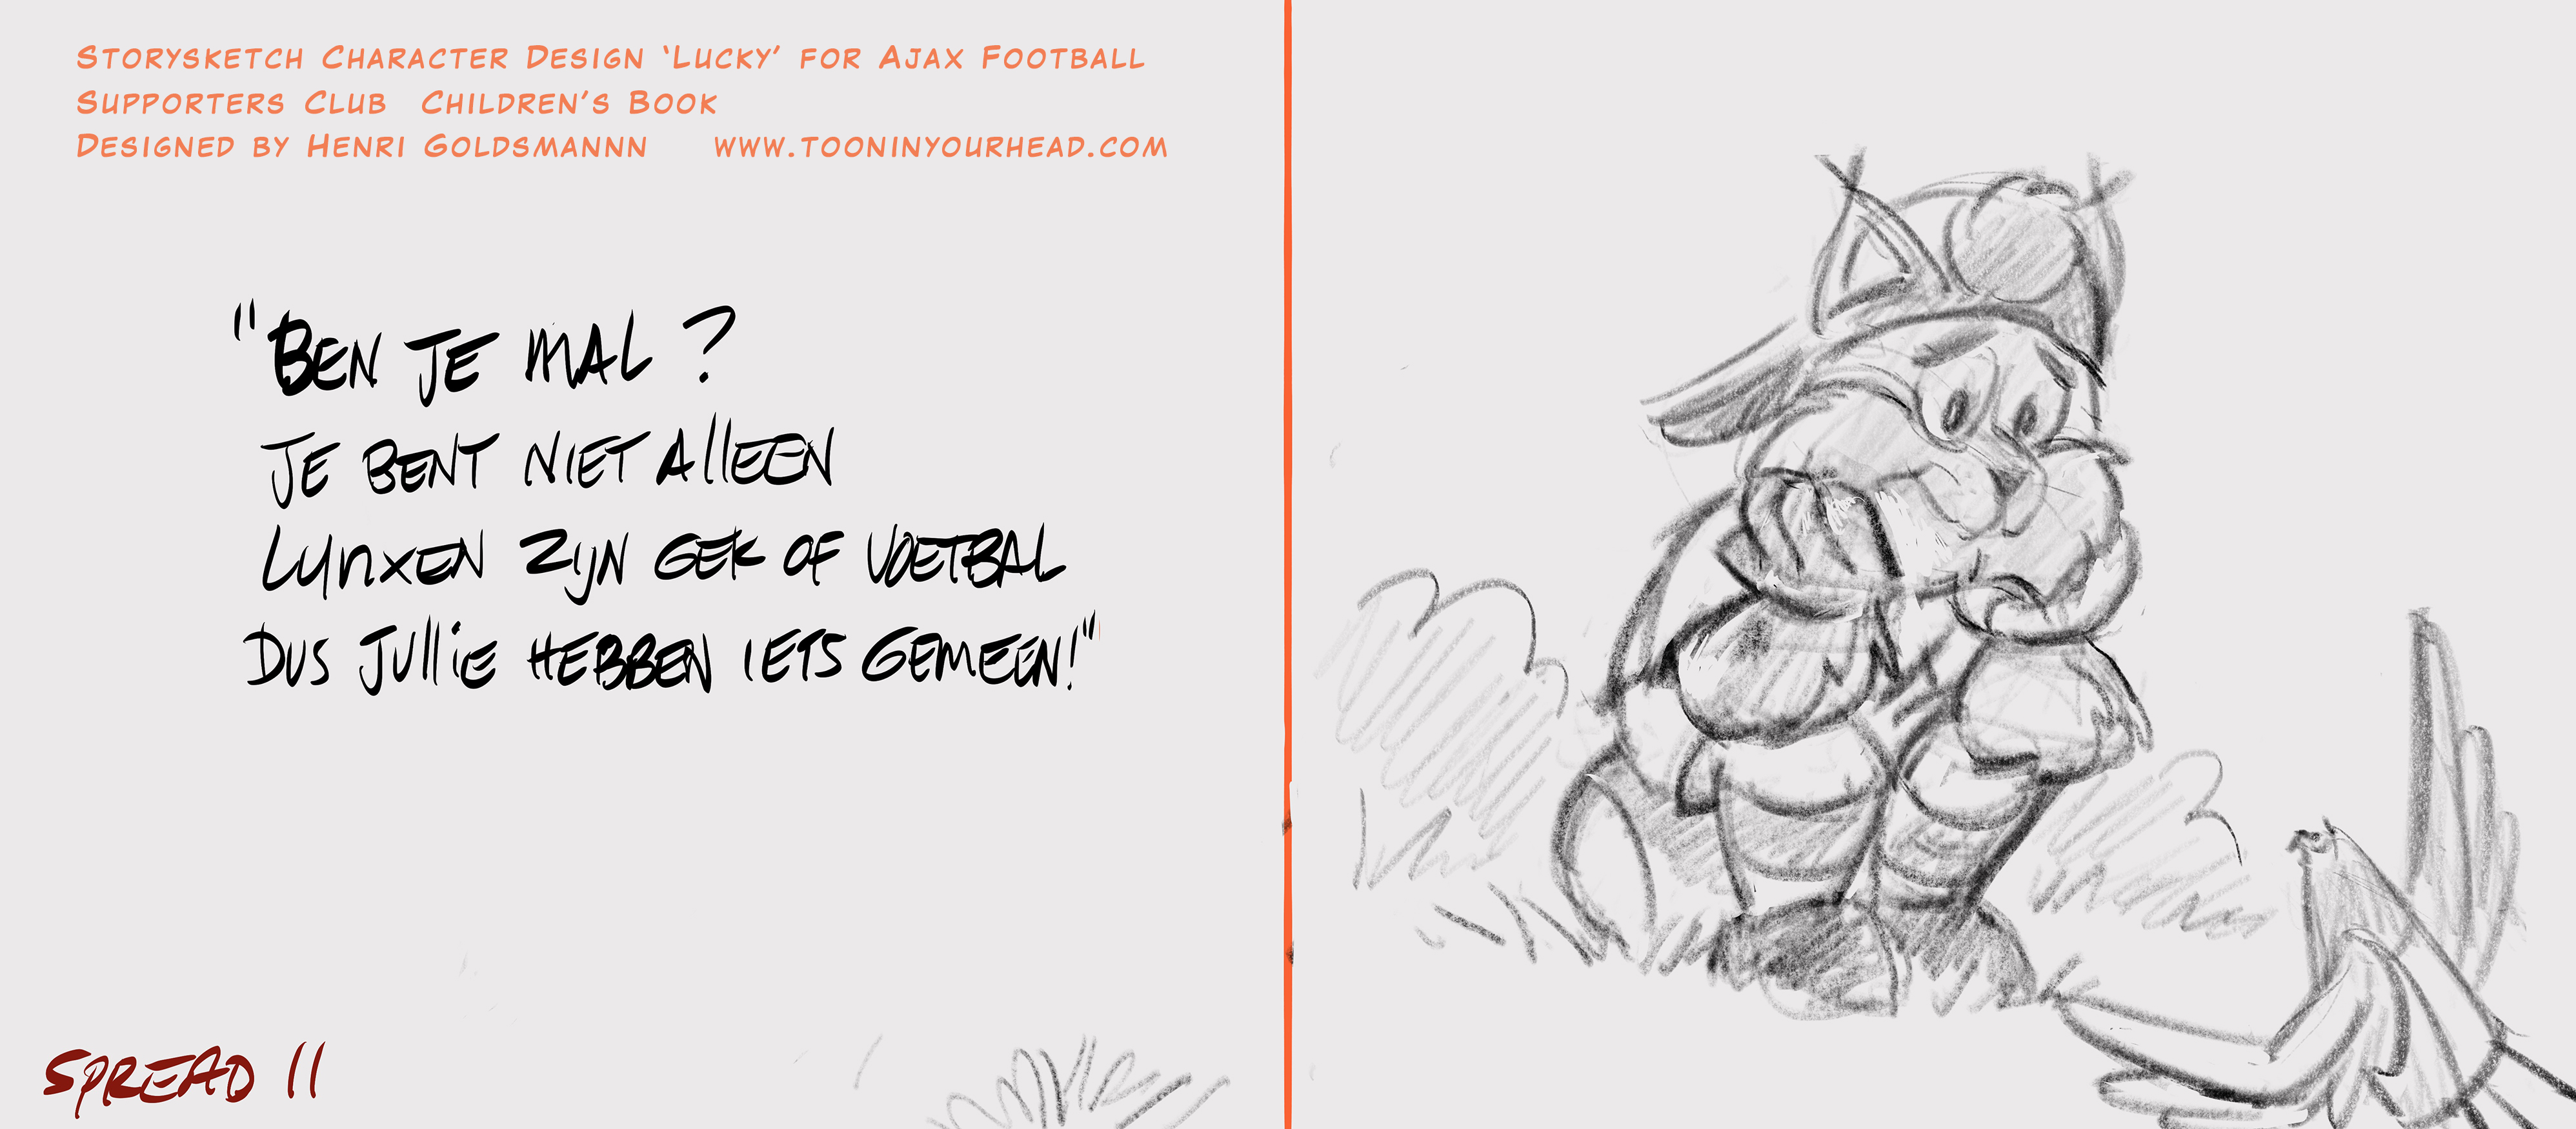 Character Design_Lucky Mascotte_Ajax